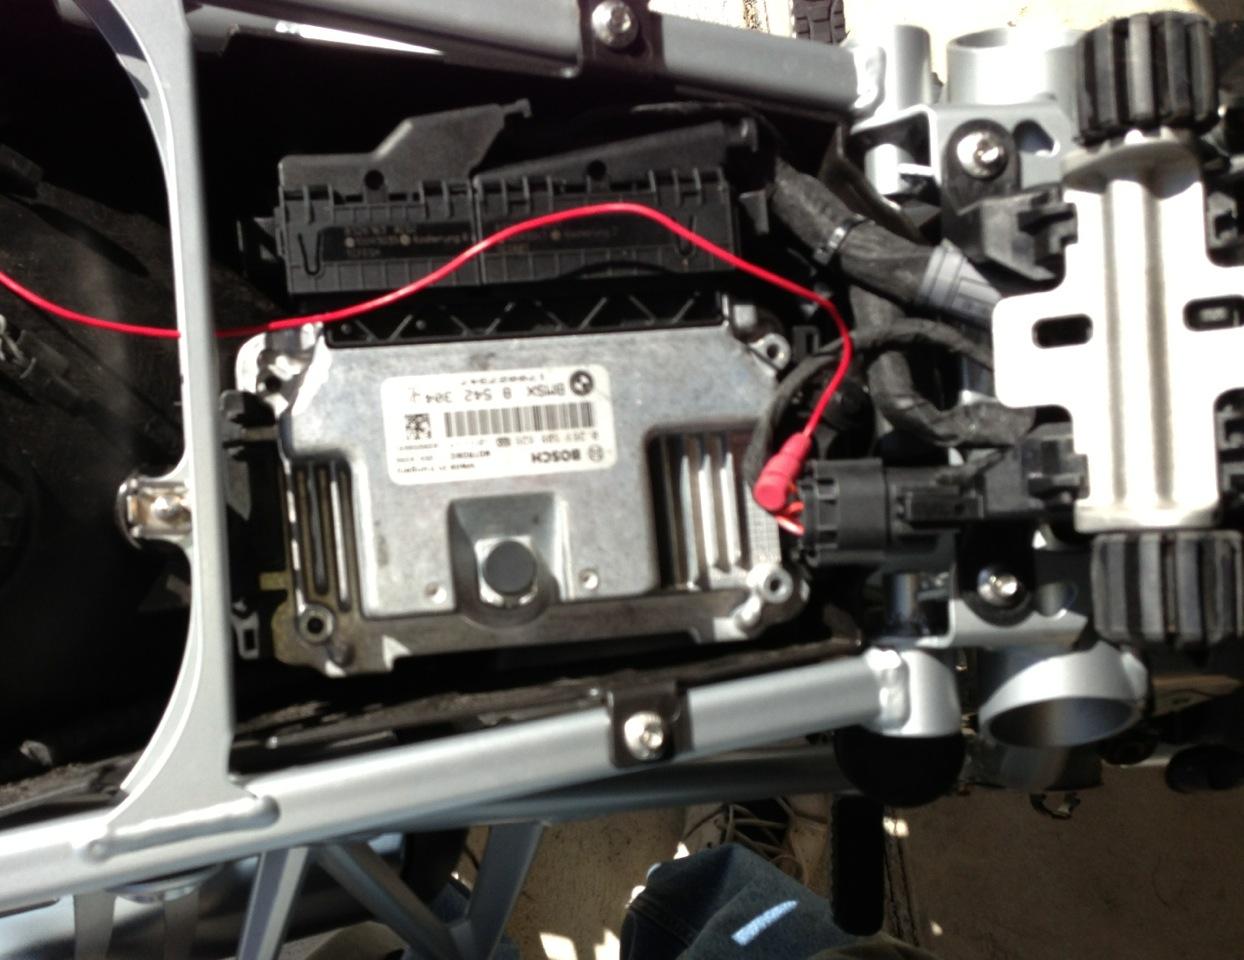 p3 brake controller wiring diagram of a building for lan networks skene design motorcycle visibility lights